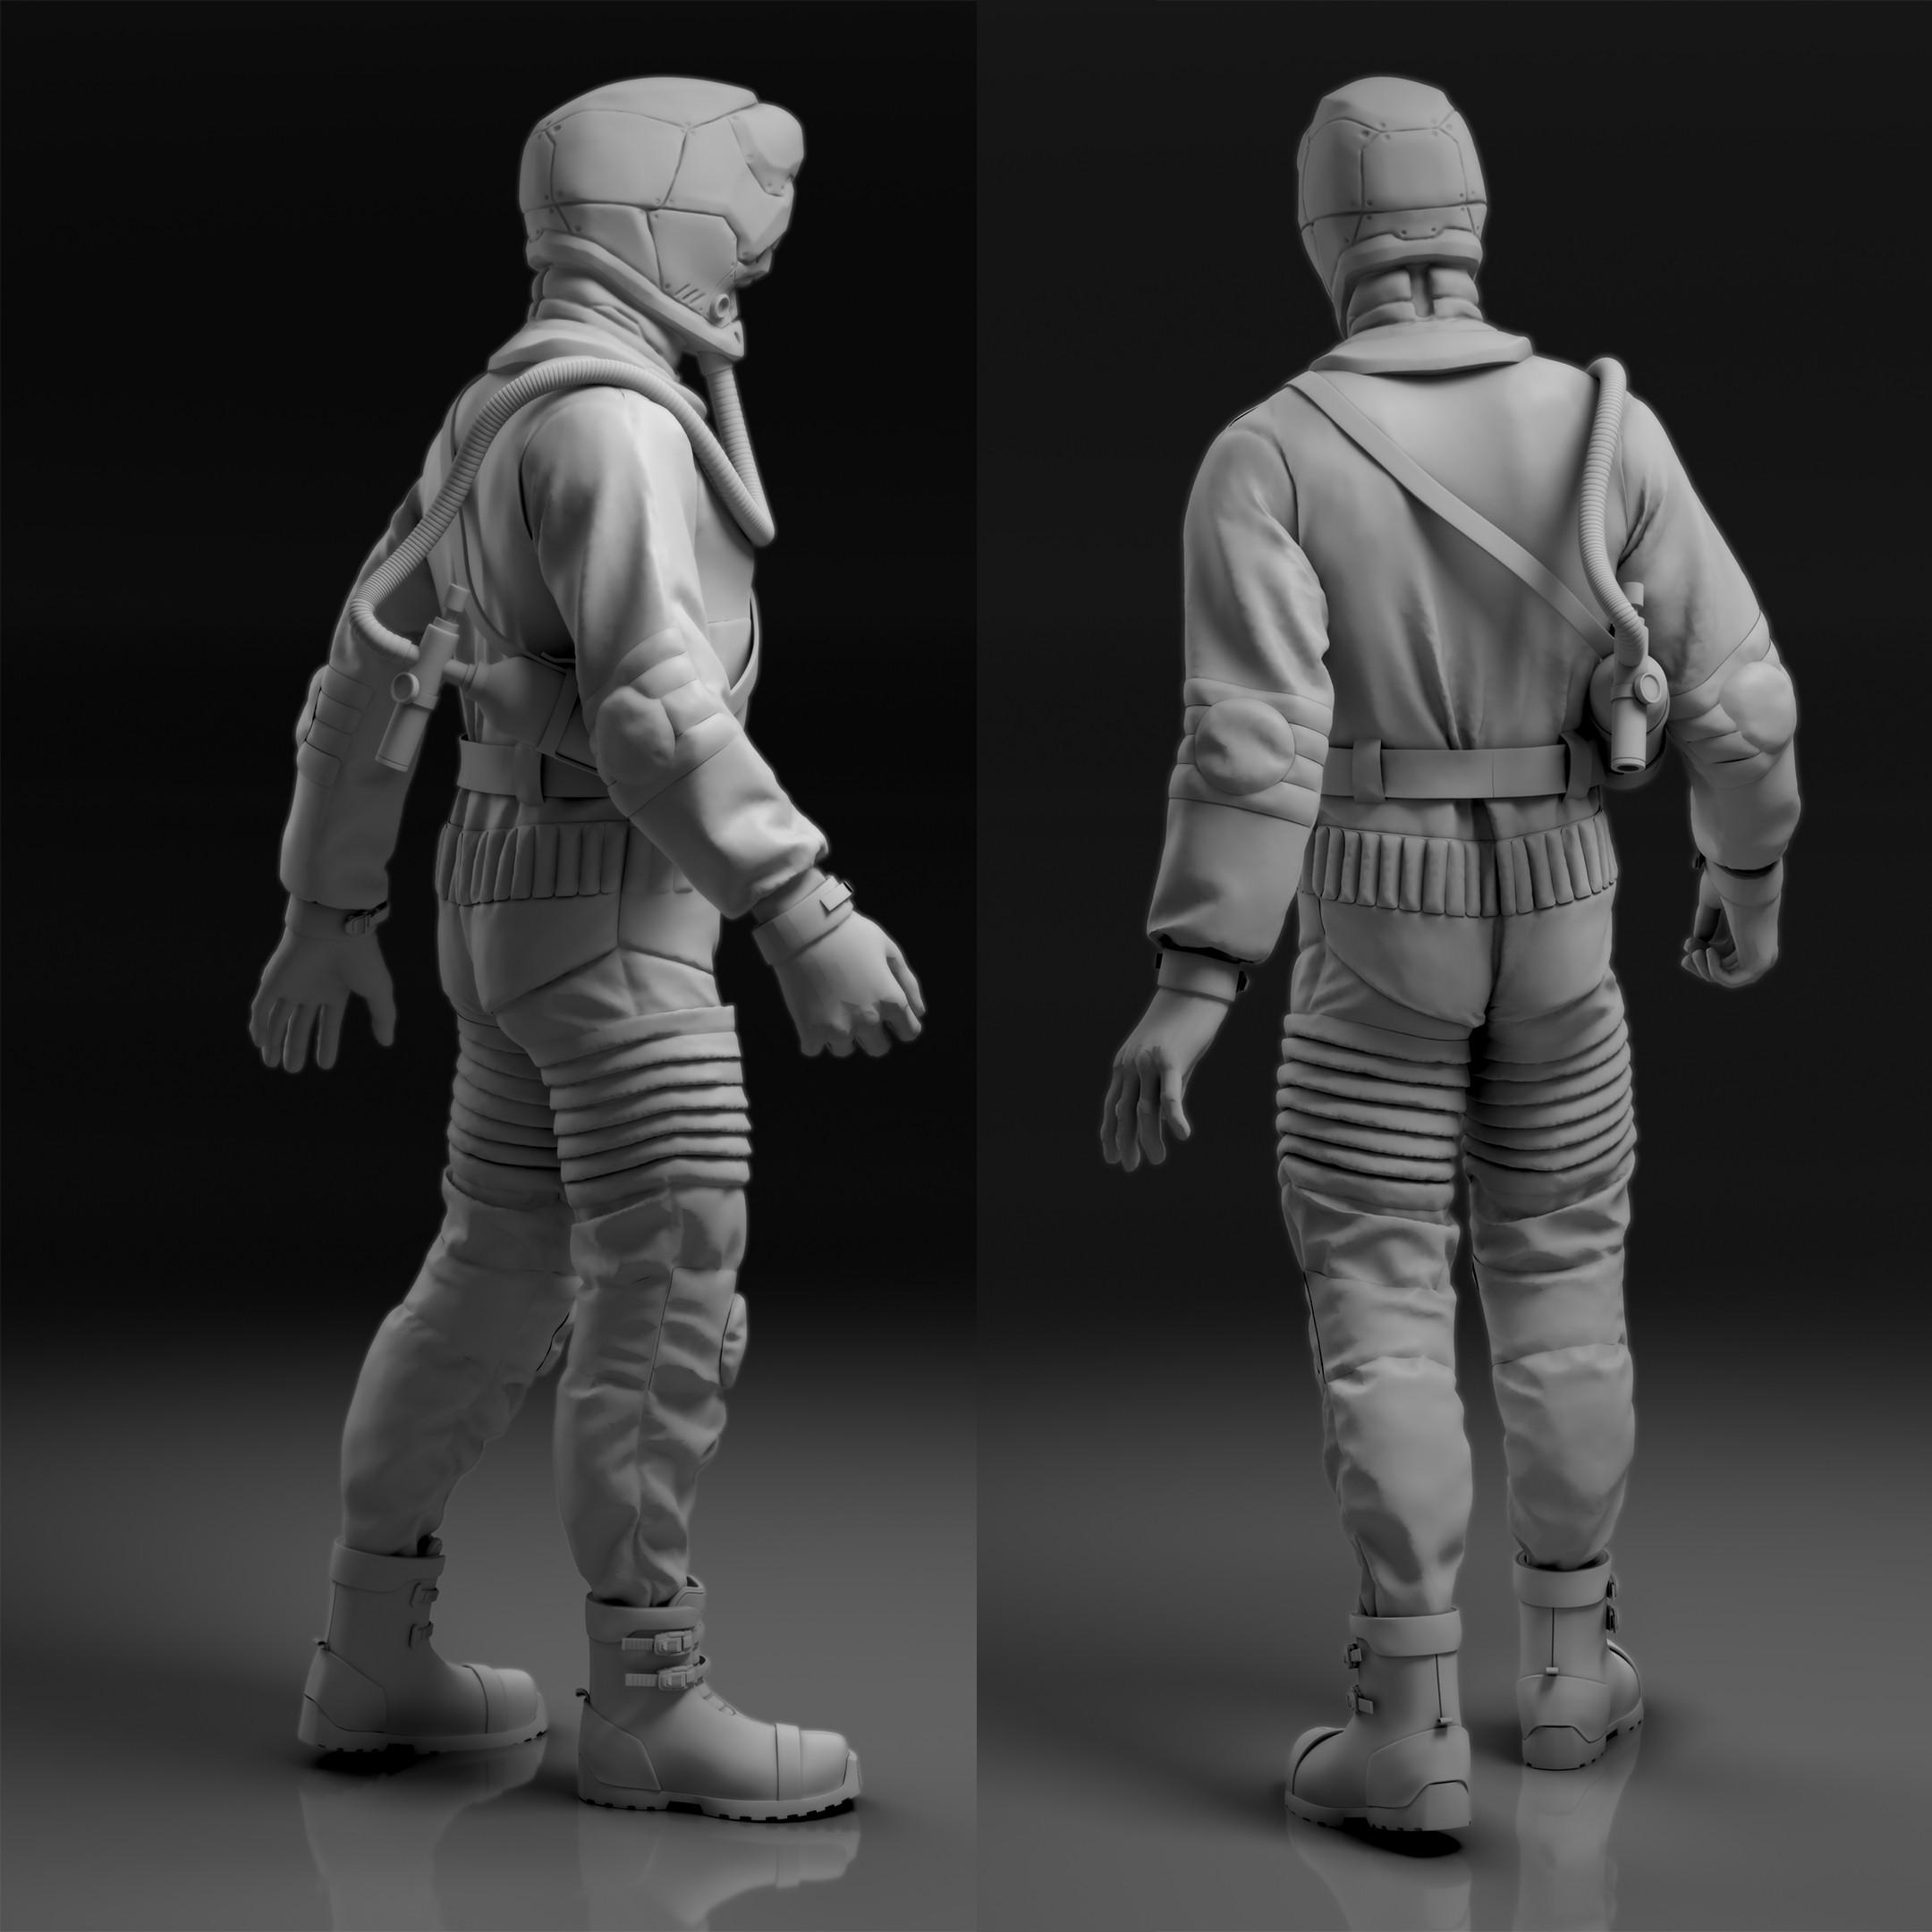 Sci-fi scientist/astronaut/worker 3d concept render.